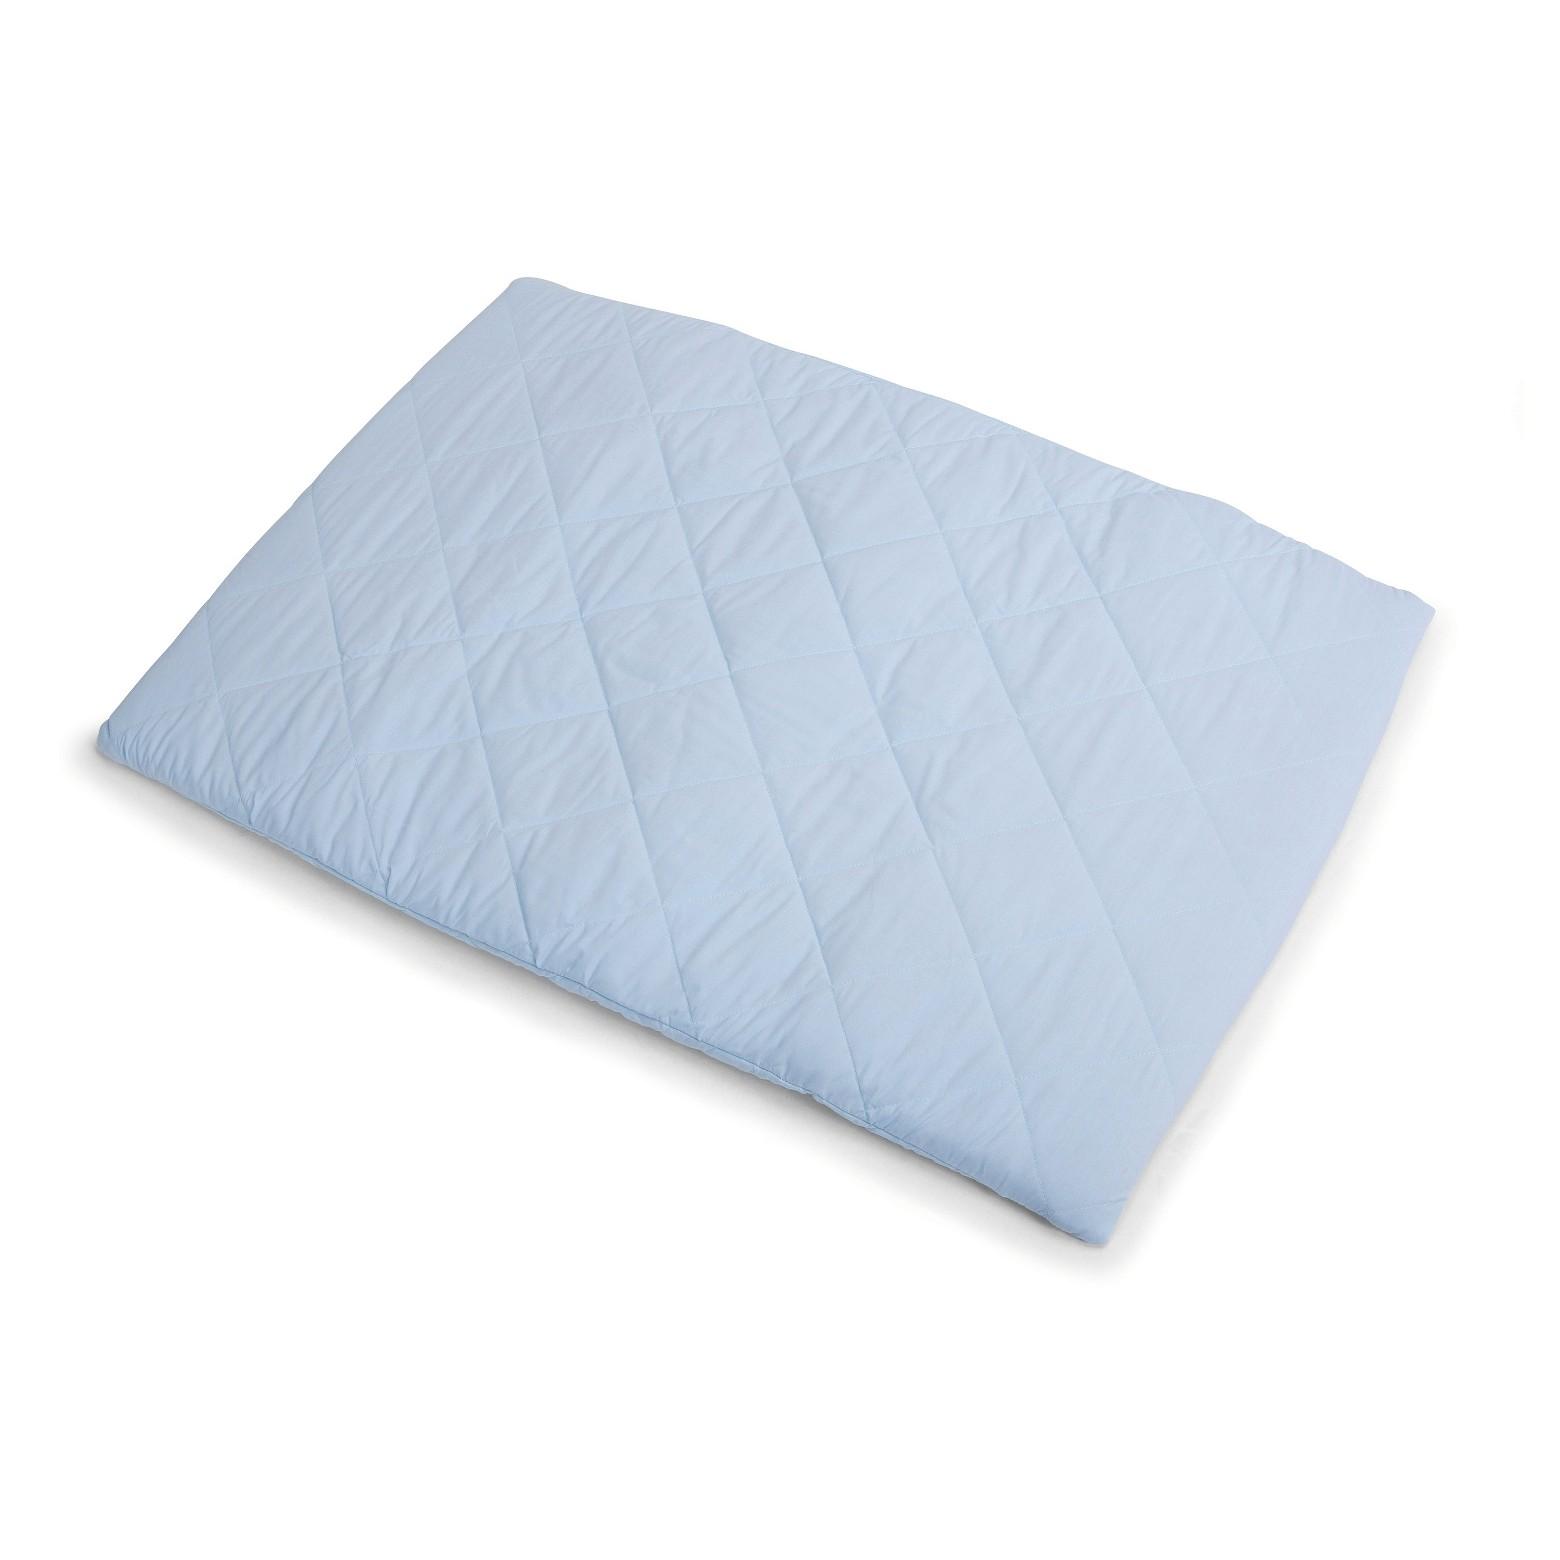 Graco® Quilted Pack 'n Play Playard Sheet